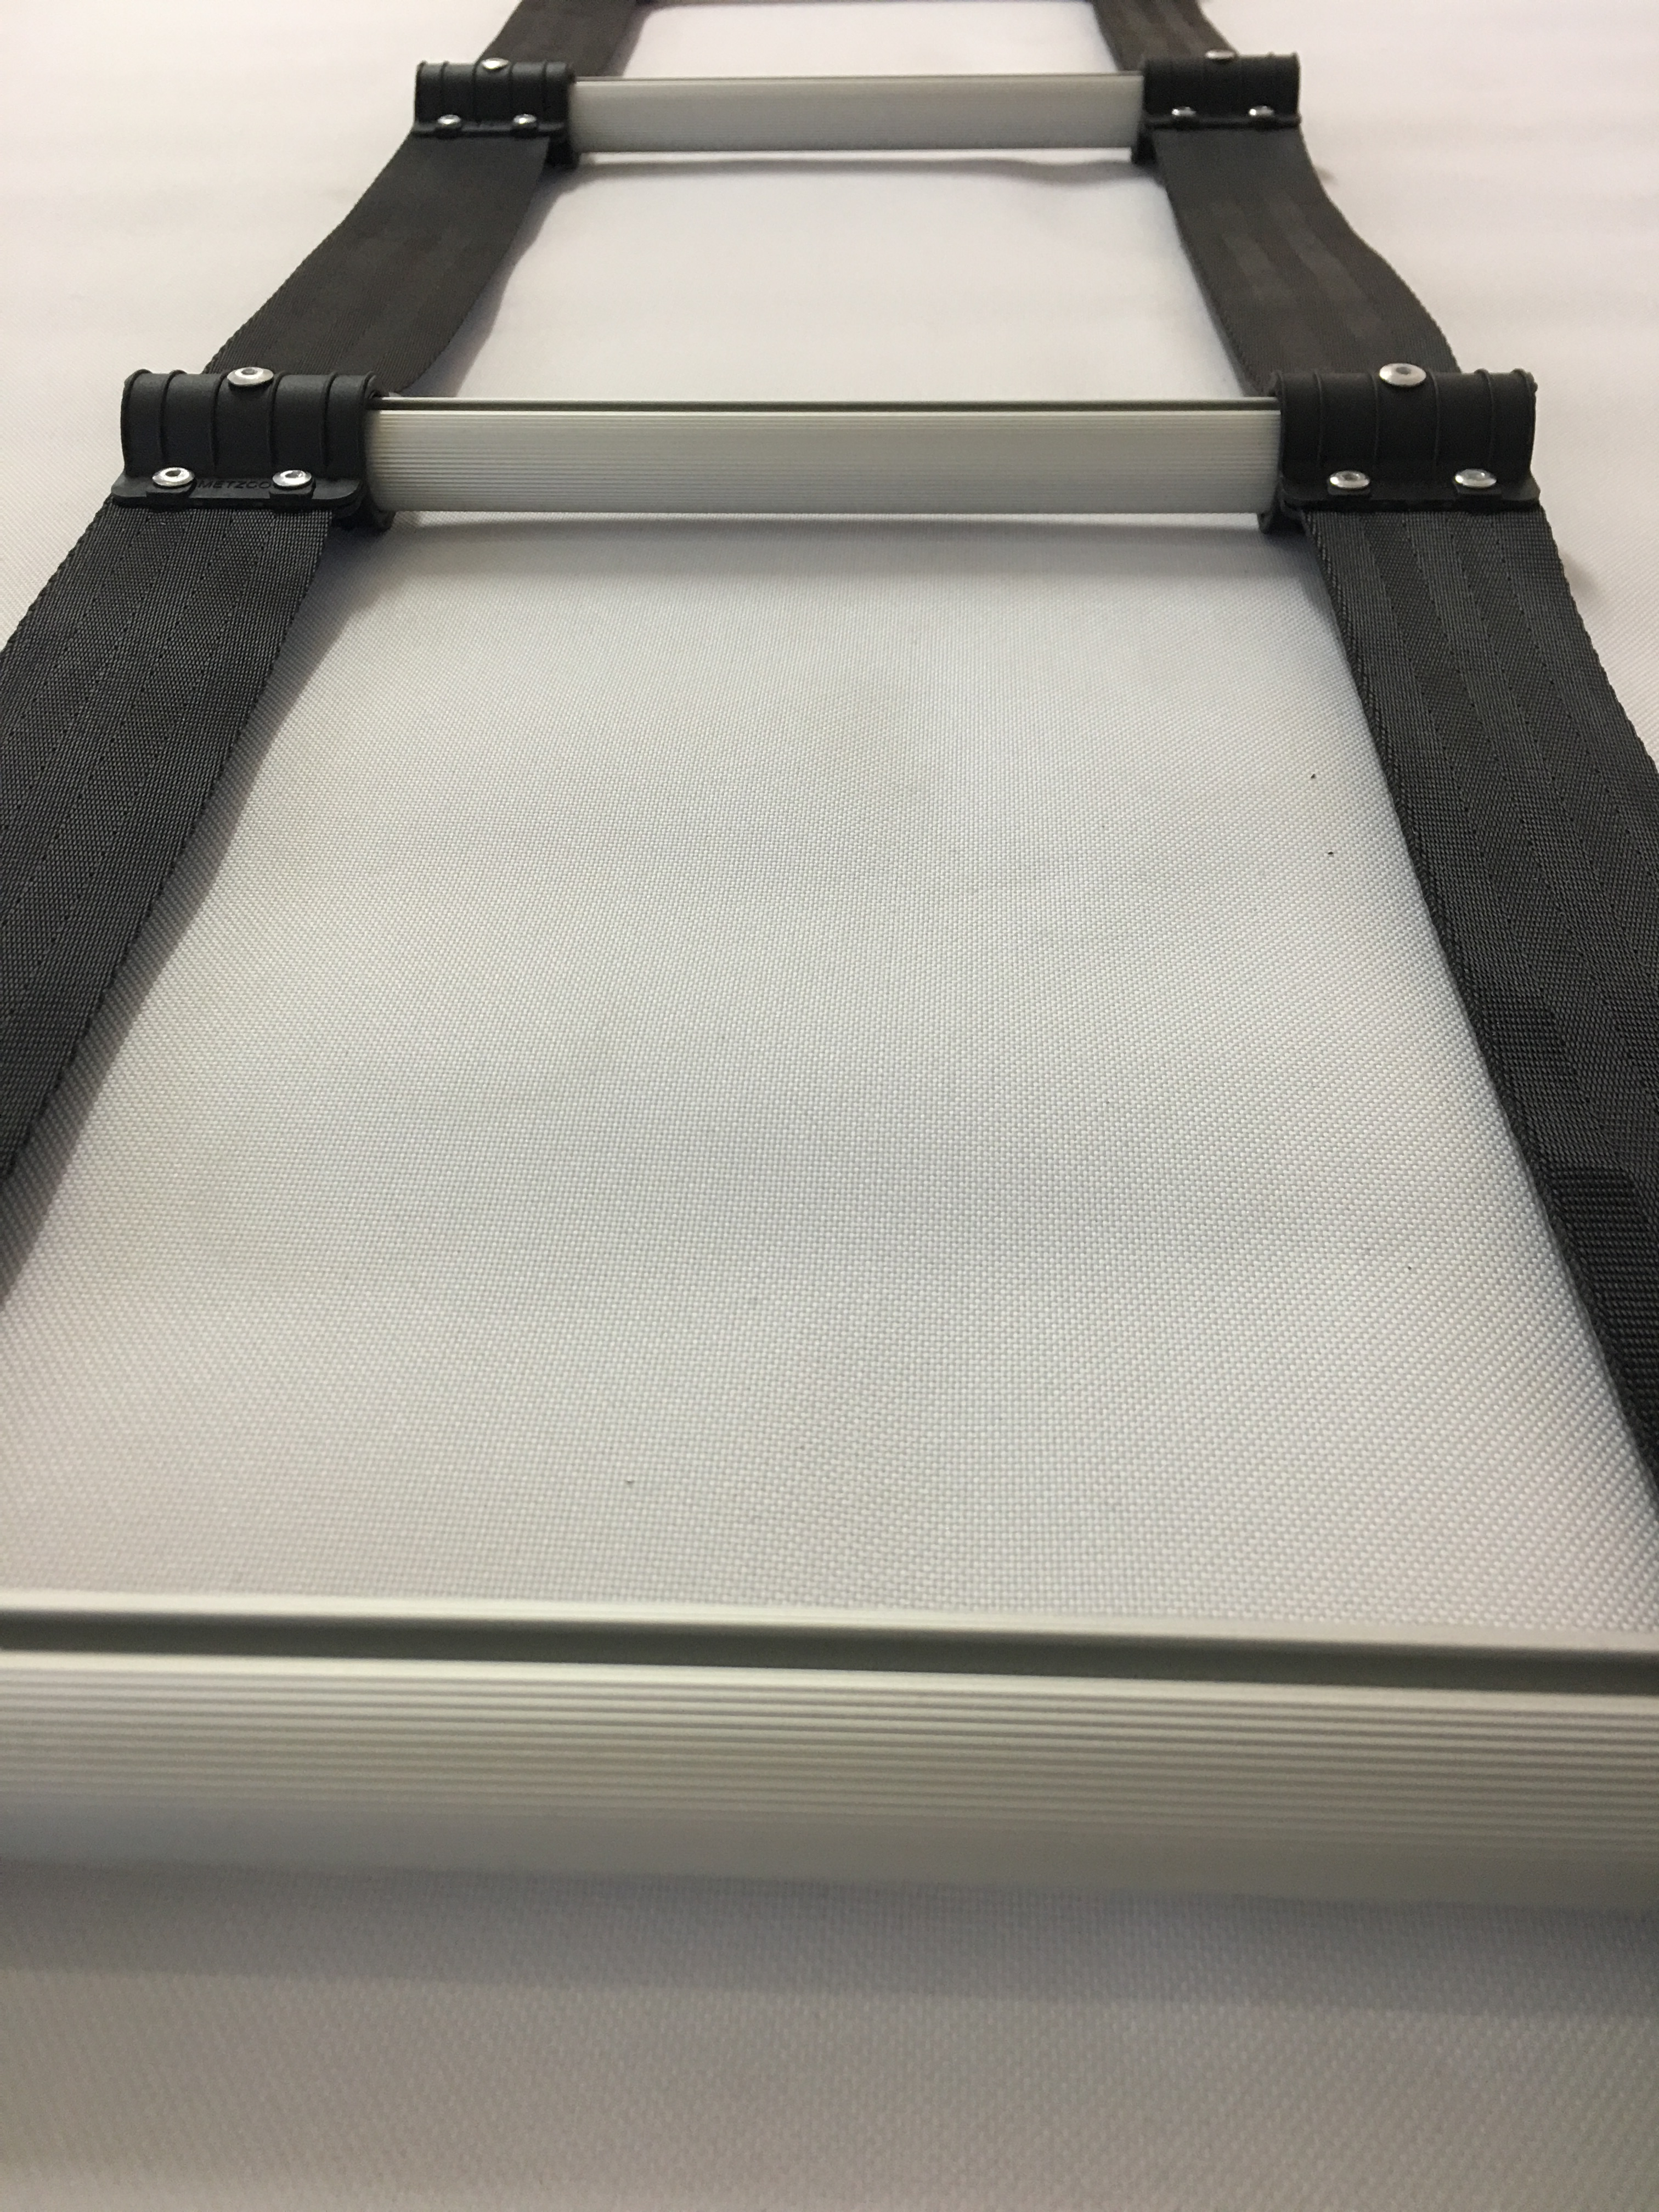 Webbing Rope Ladder